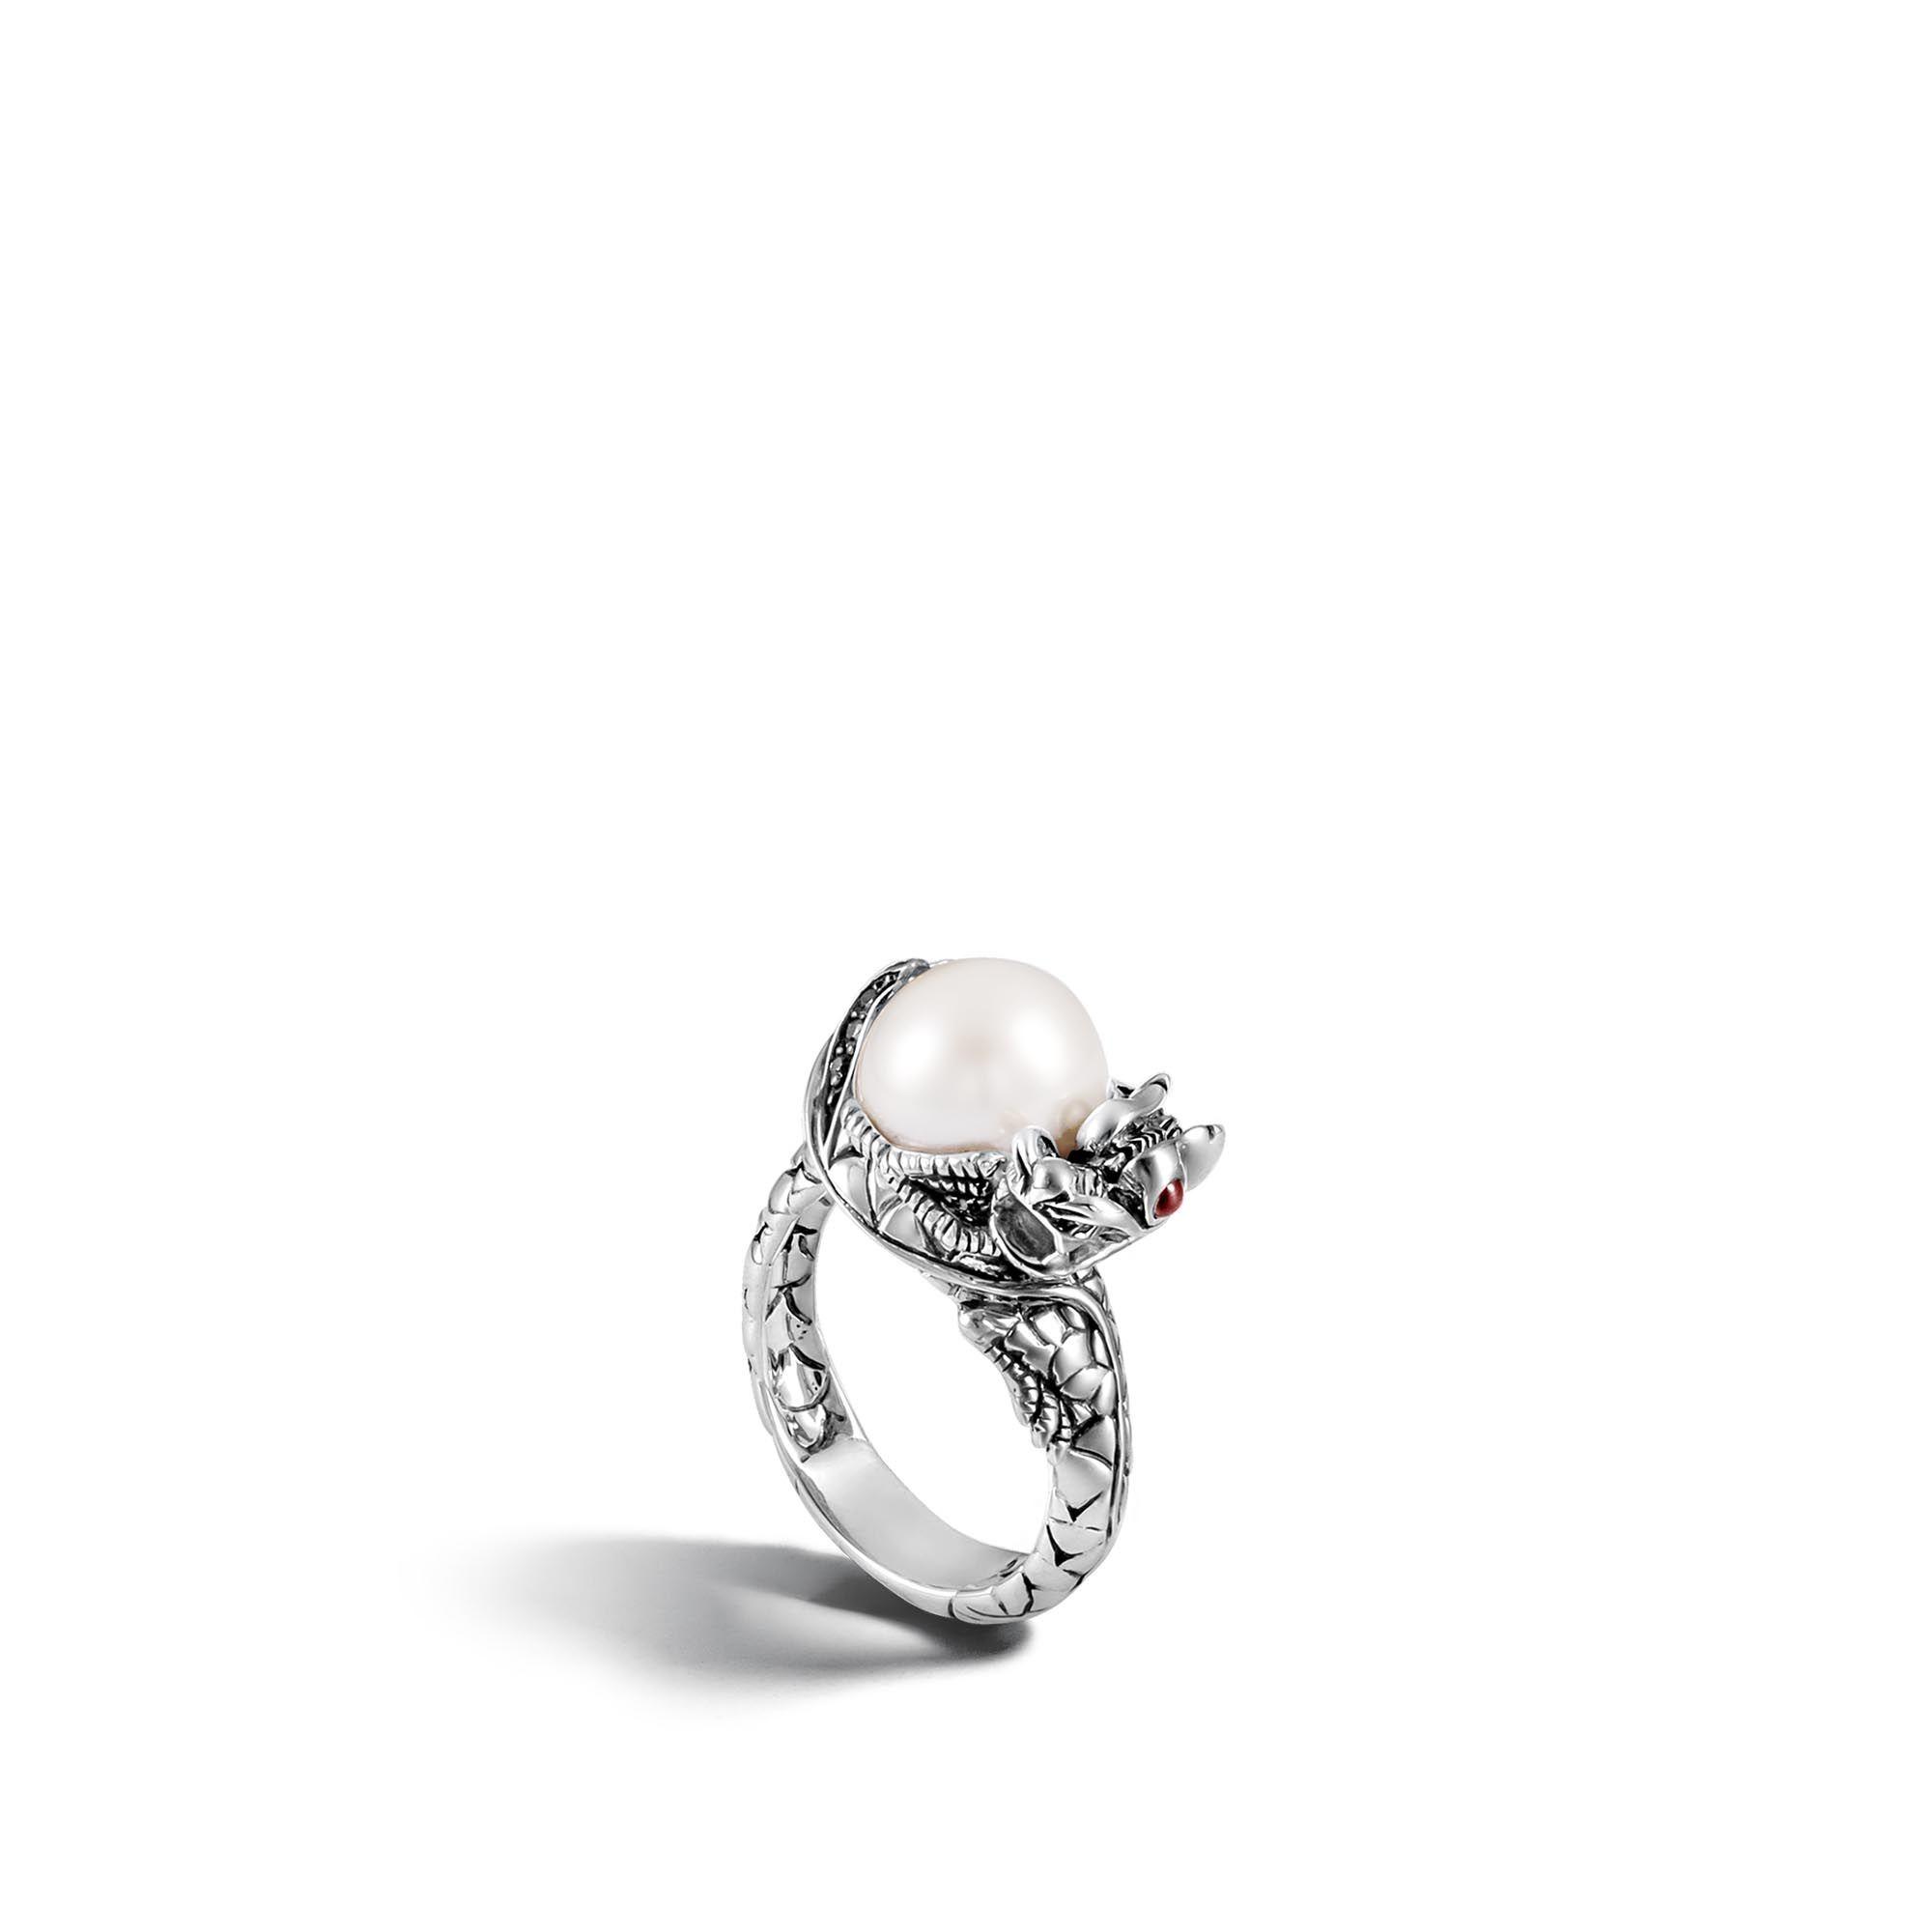 John Hardy Naga Silver Lava Small Dragon Ring with Freshwater Pearl QldJoihZ8n